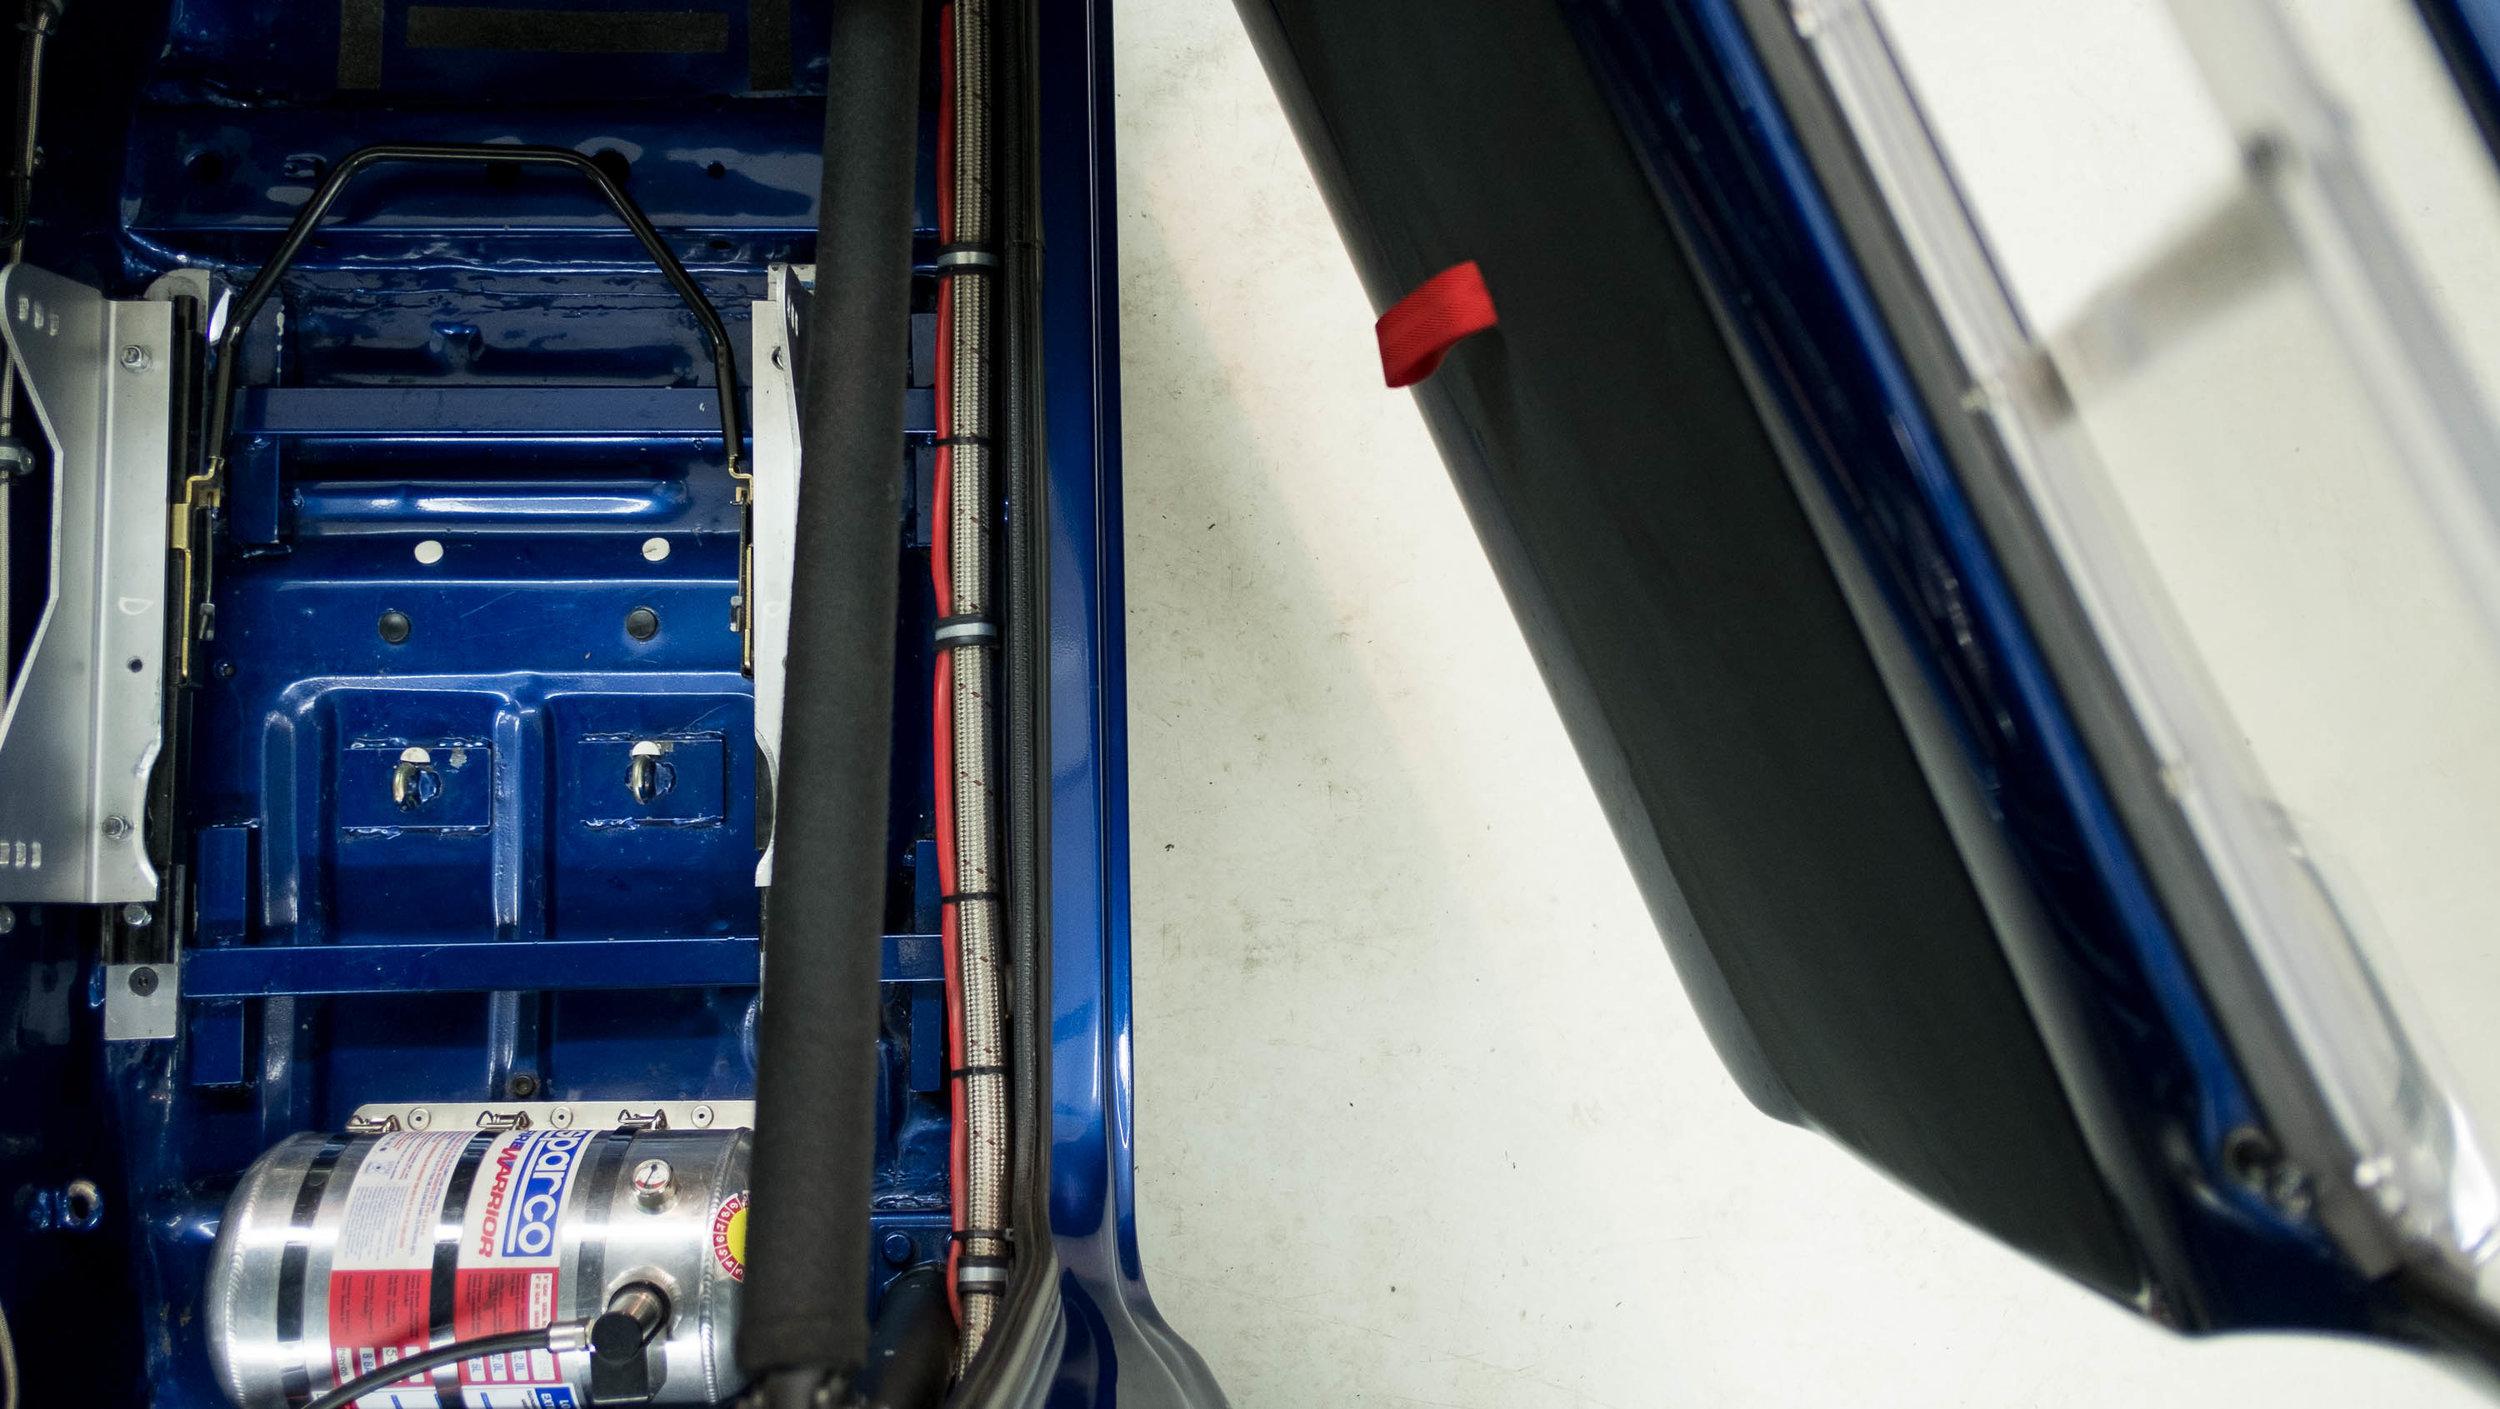 coolnvintage Ford Escort MKI (56 of 87).jpg